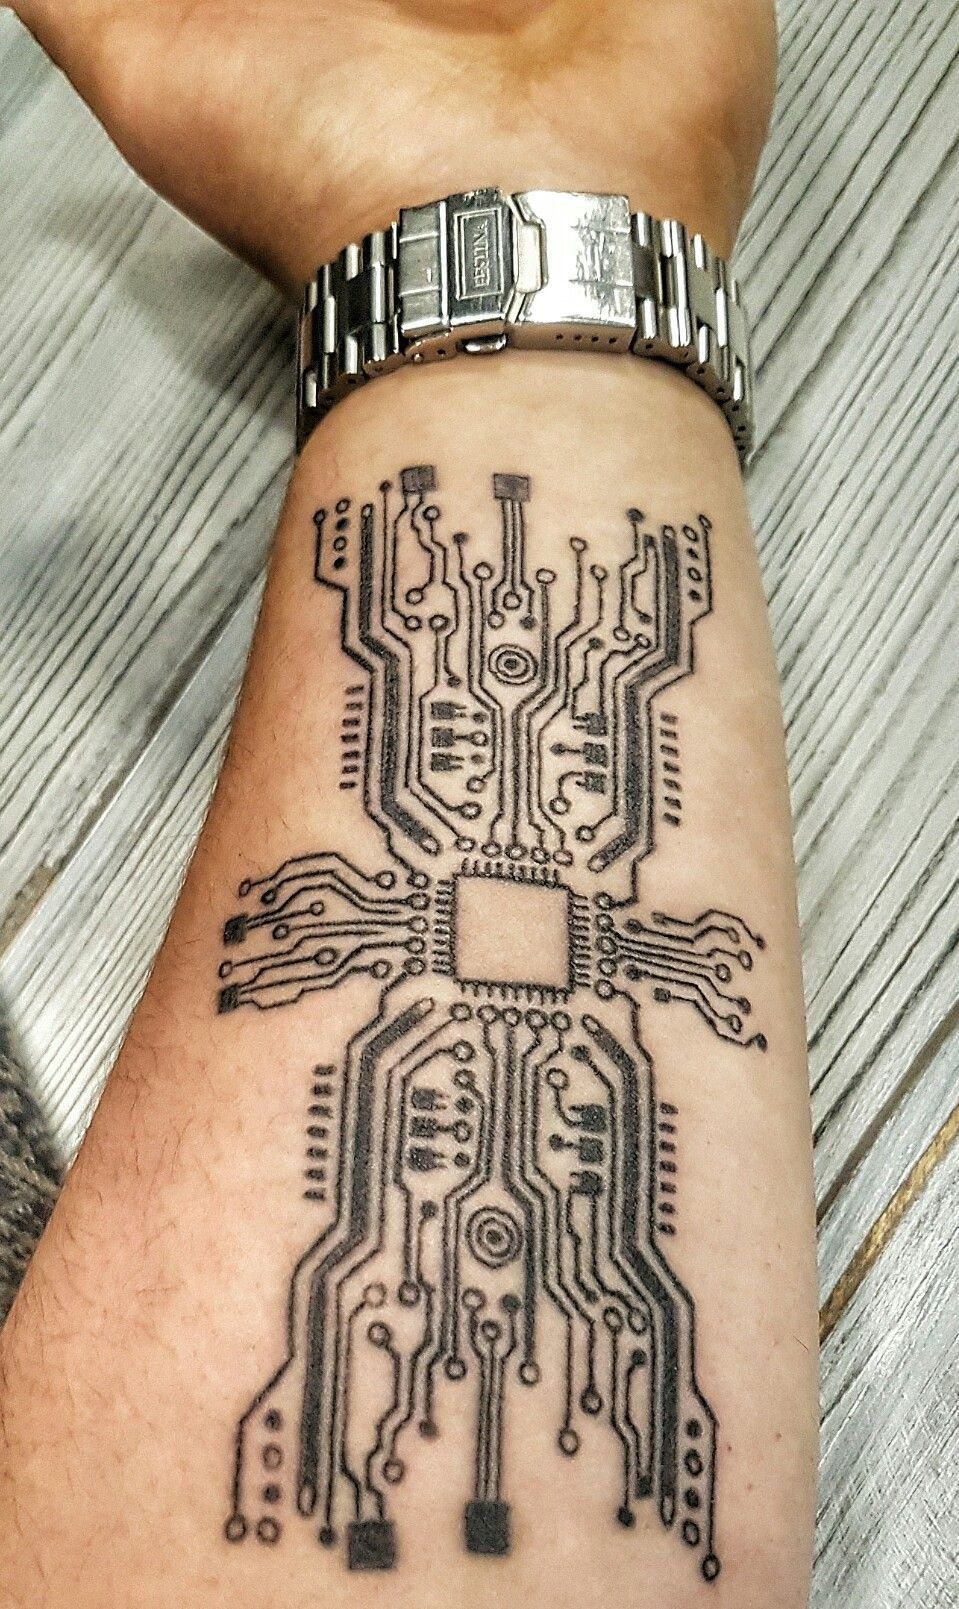 Cpu tattoo Tatuagem cyberpunk, Tatuagem, Tatuagens